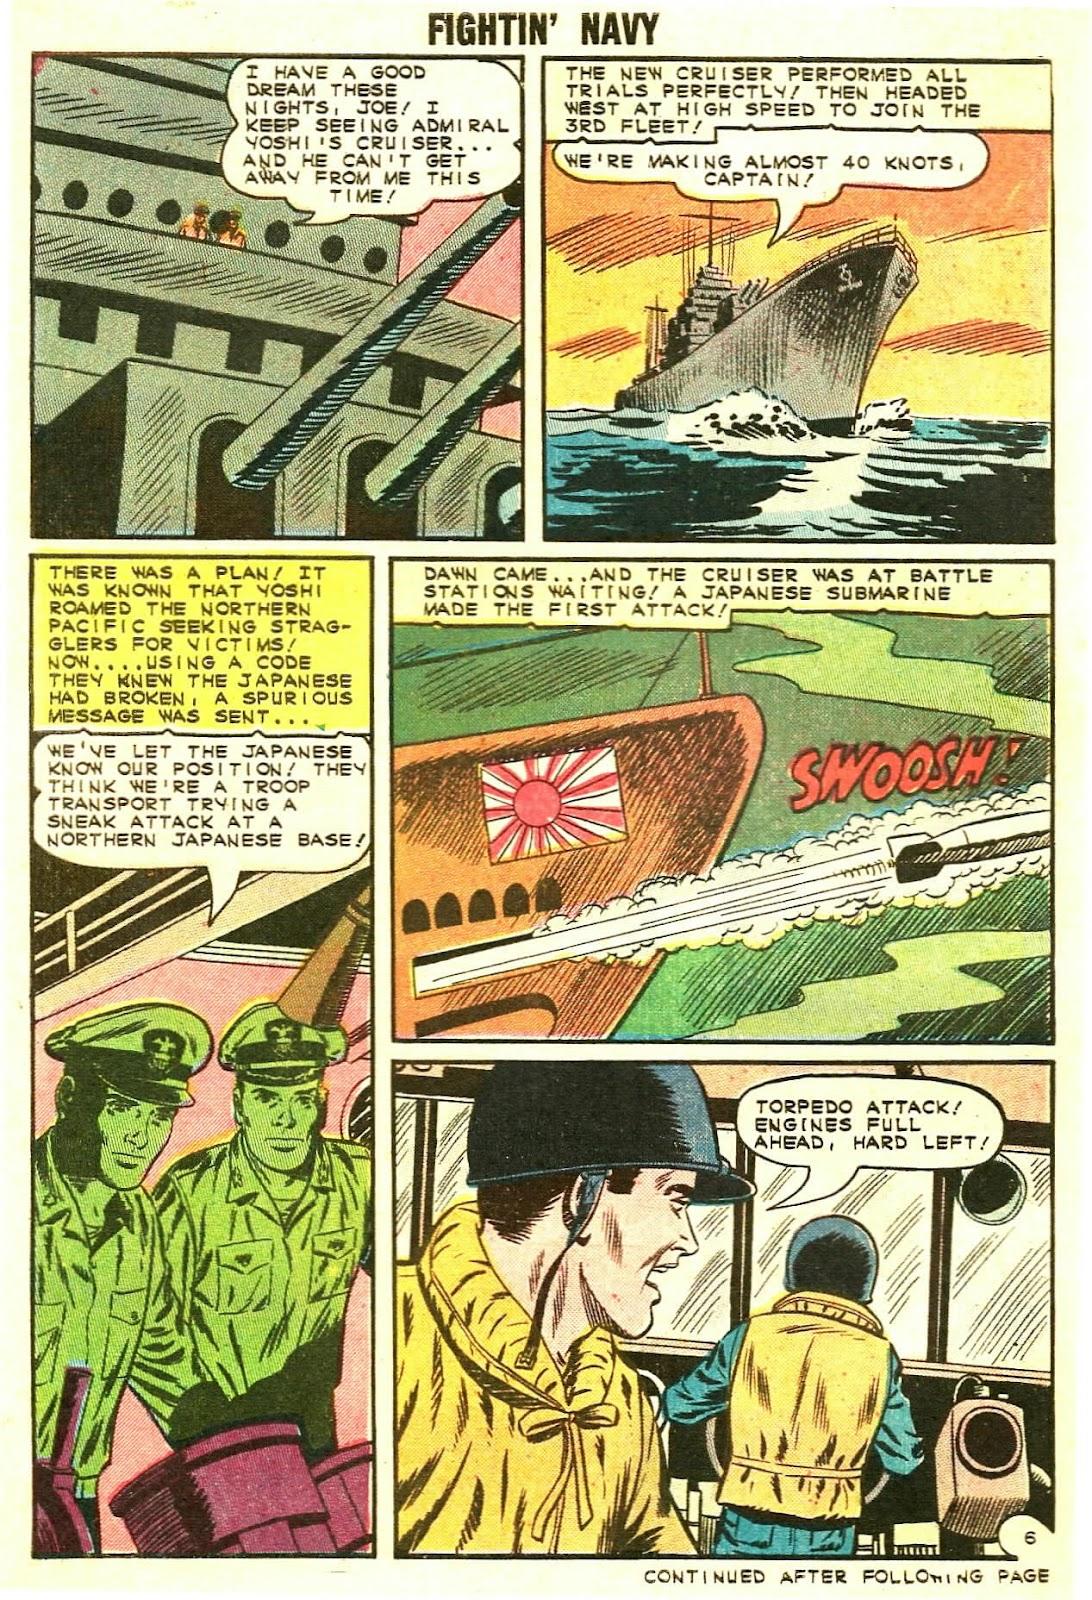 Read online Fightin' Navy comic -  Issue #119 - 30